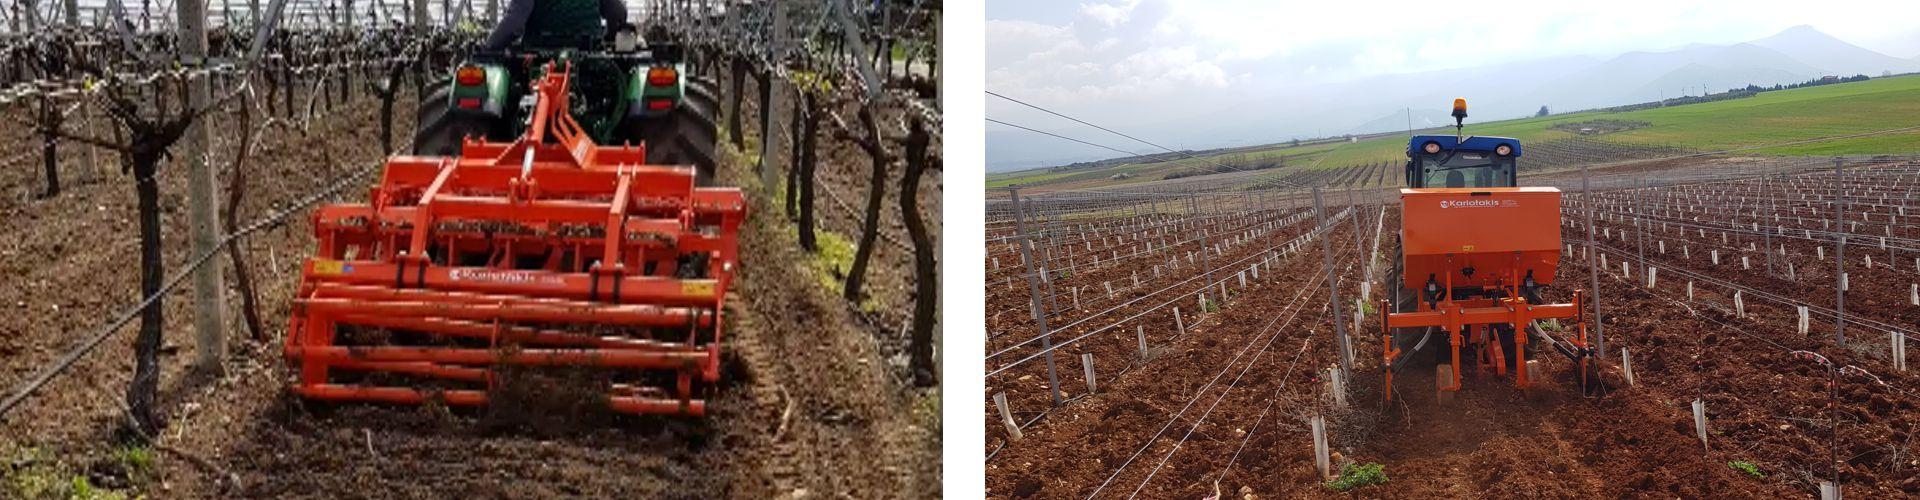 Vineyard Machineries